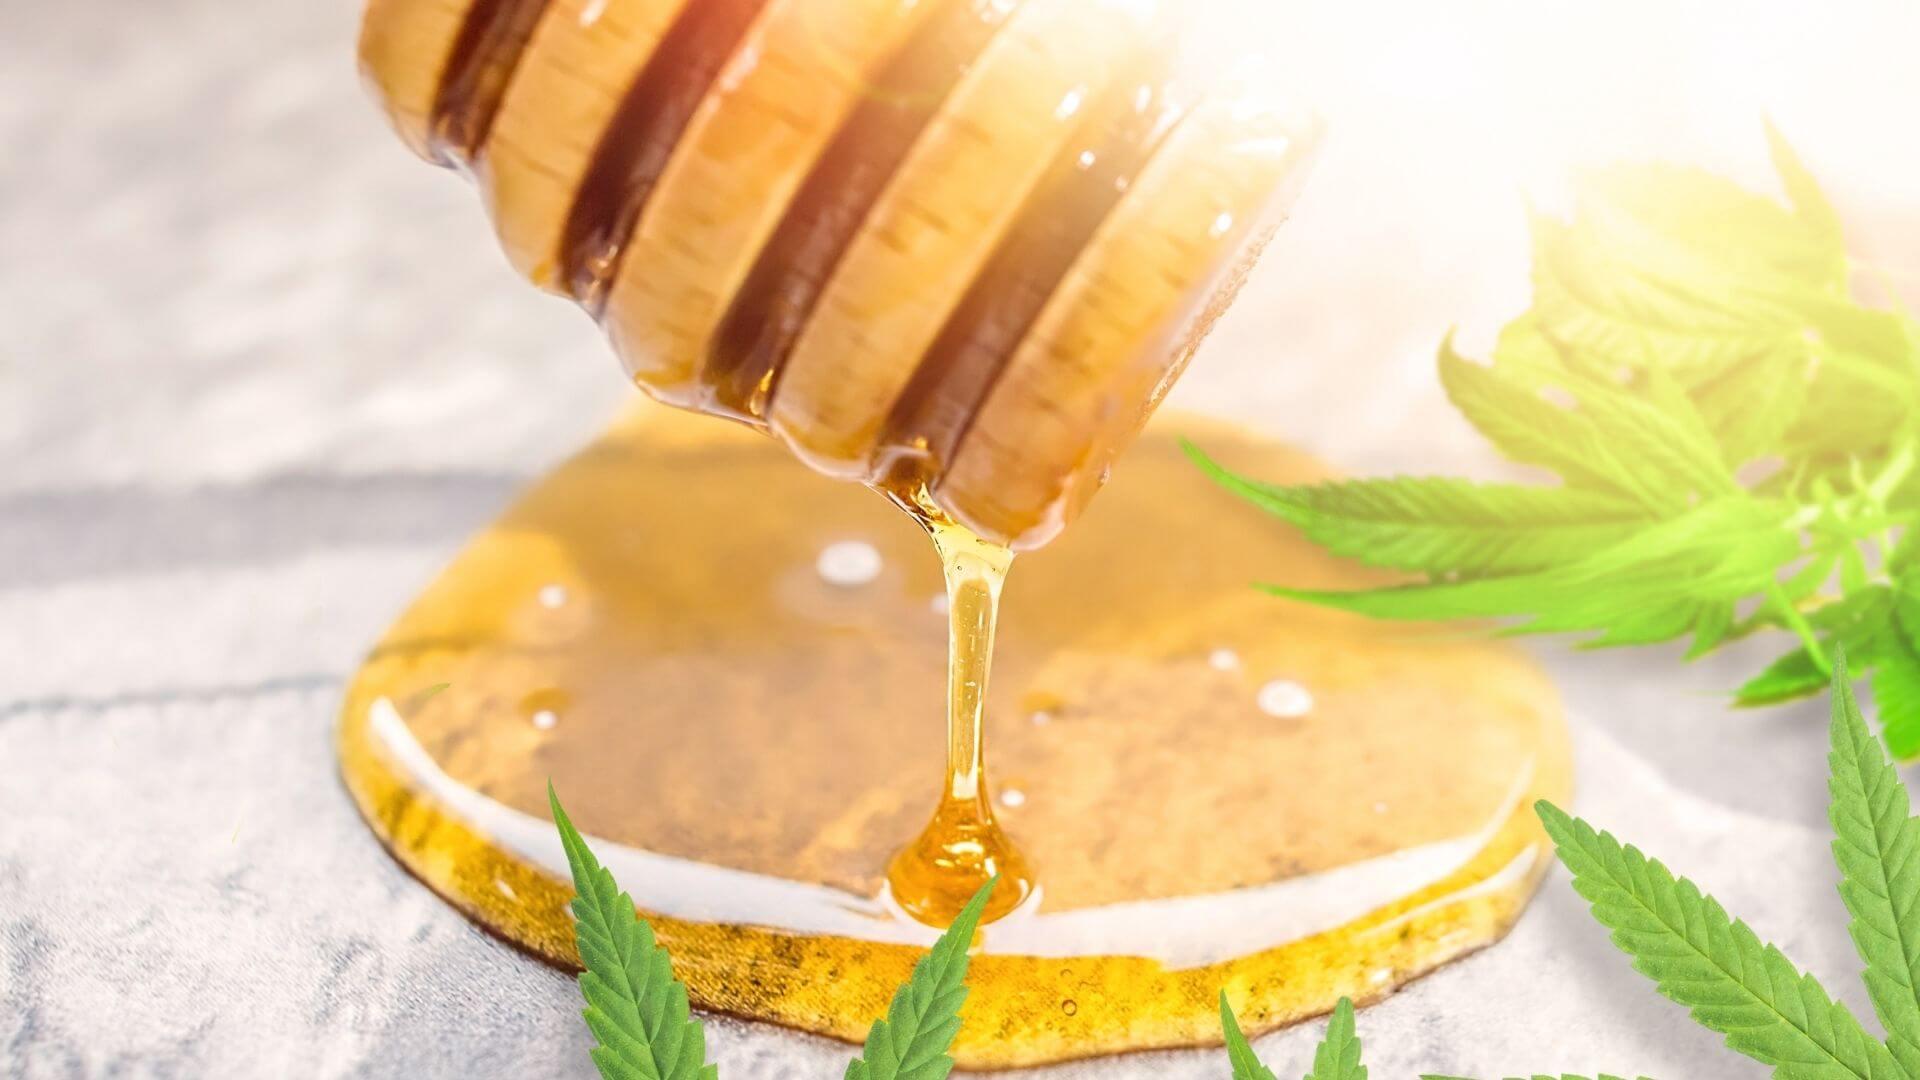 CBD Honey dropping on a surface representing CBD Edibles